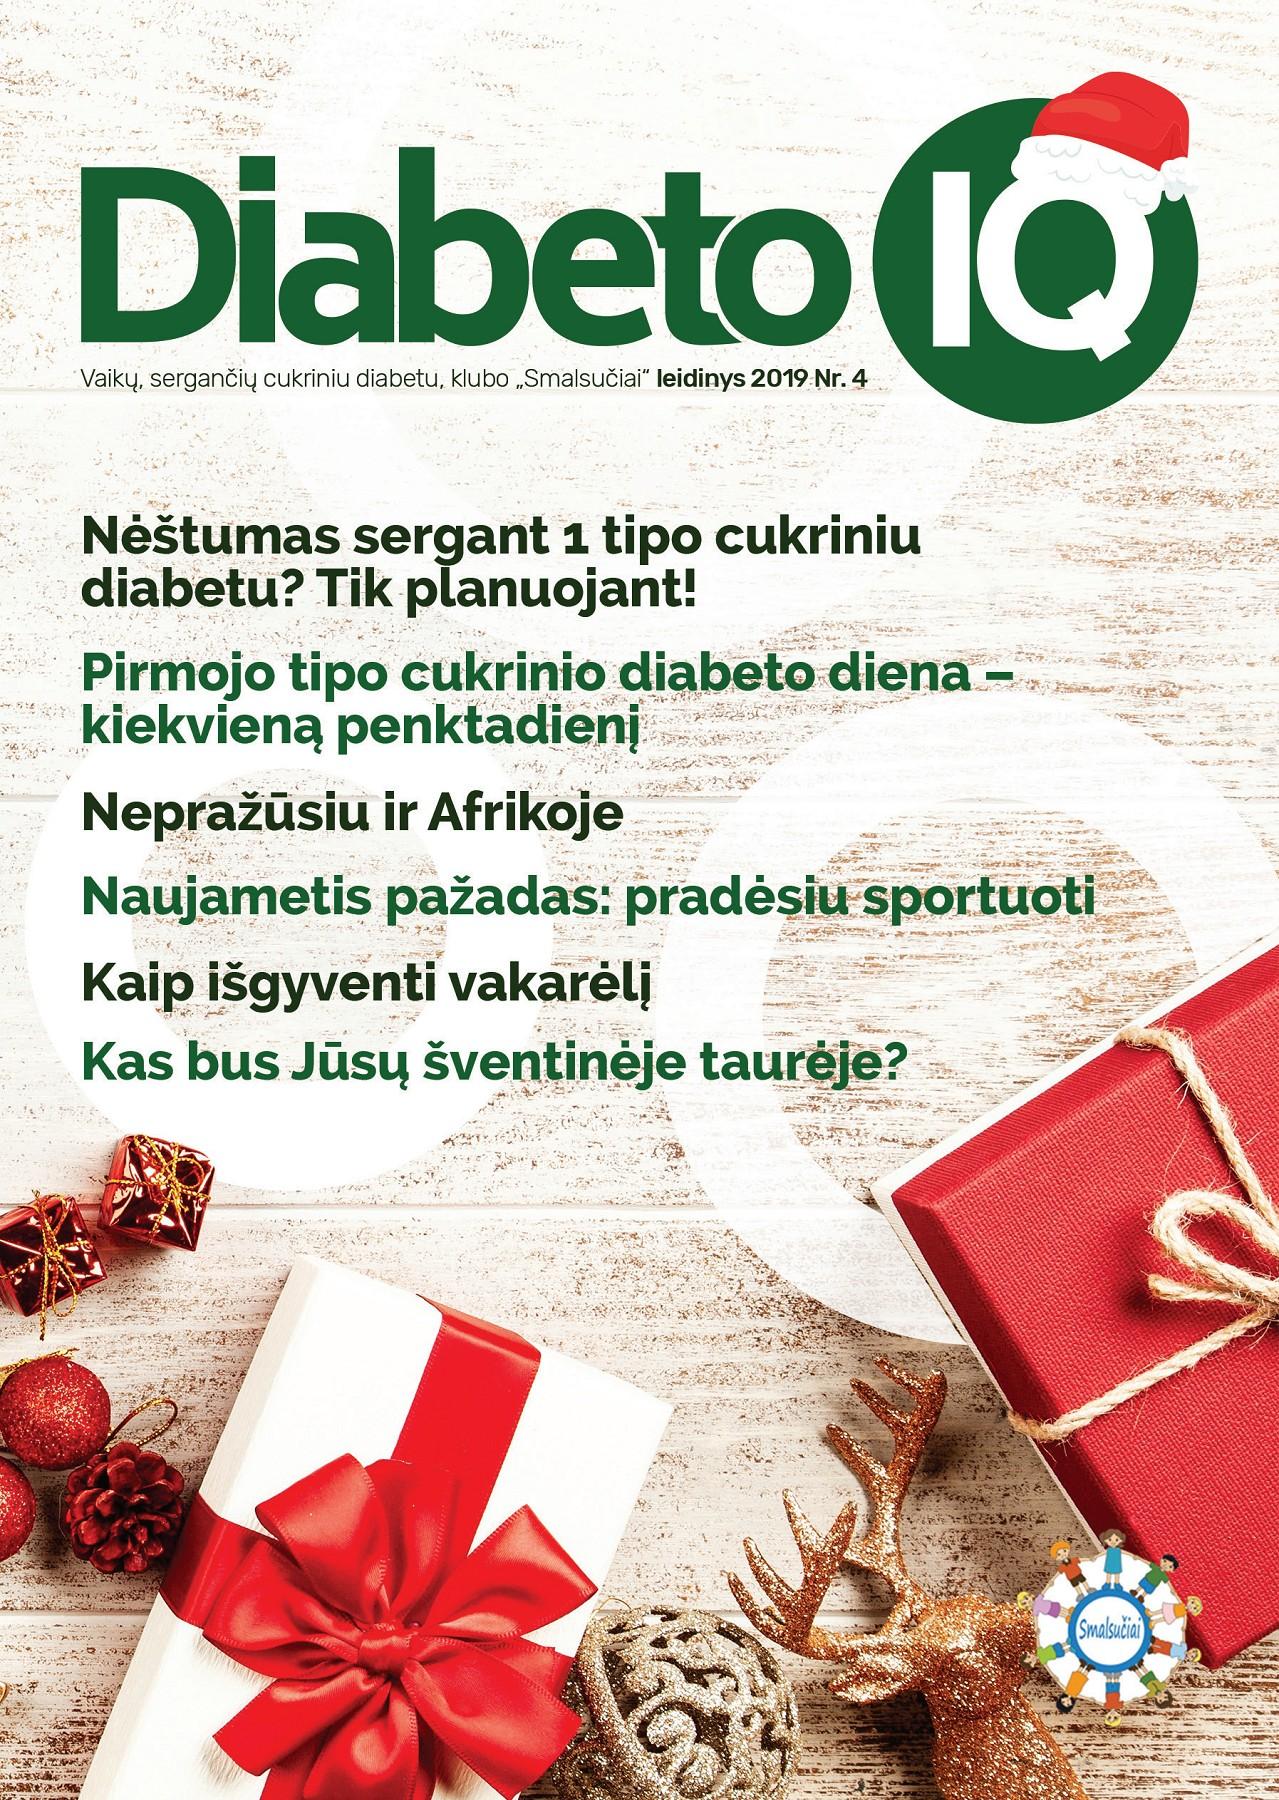 hipertenzija sergant 1 tipo cukriniu diabetu